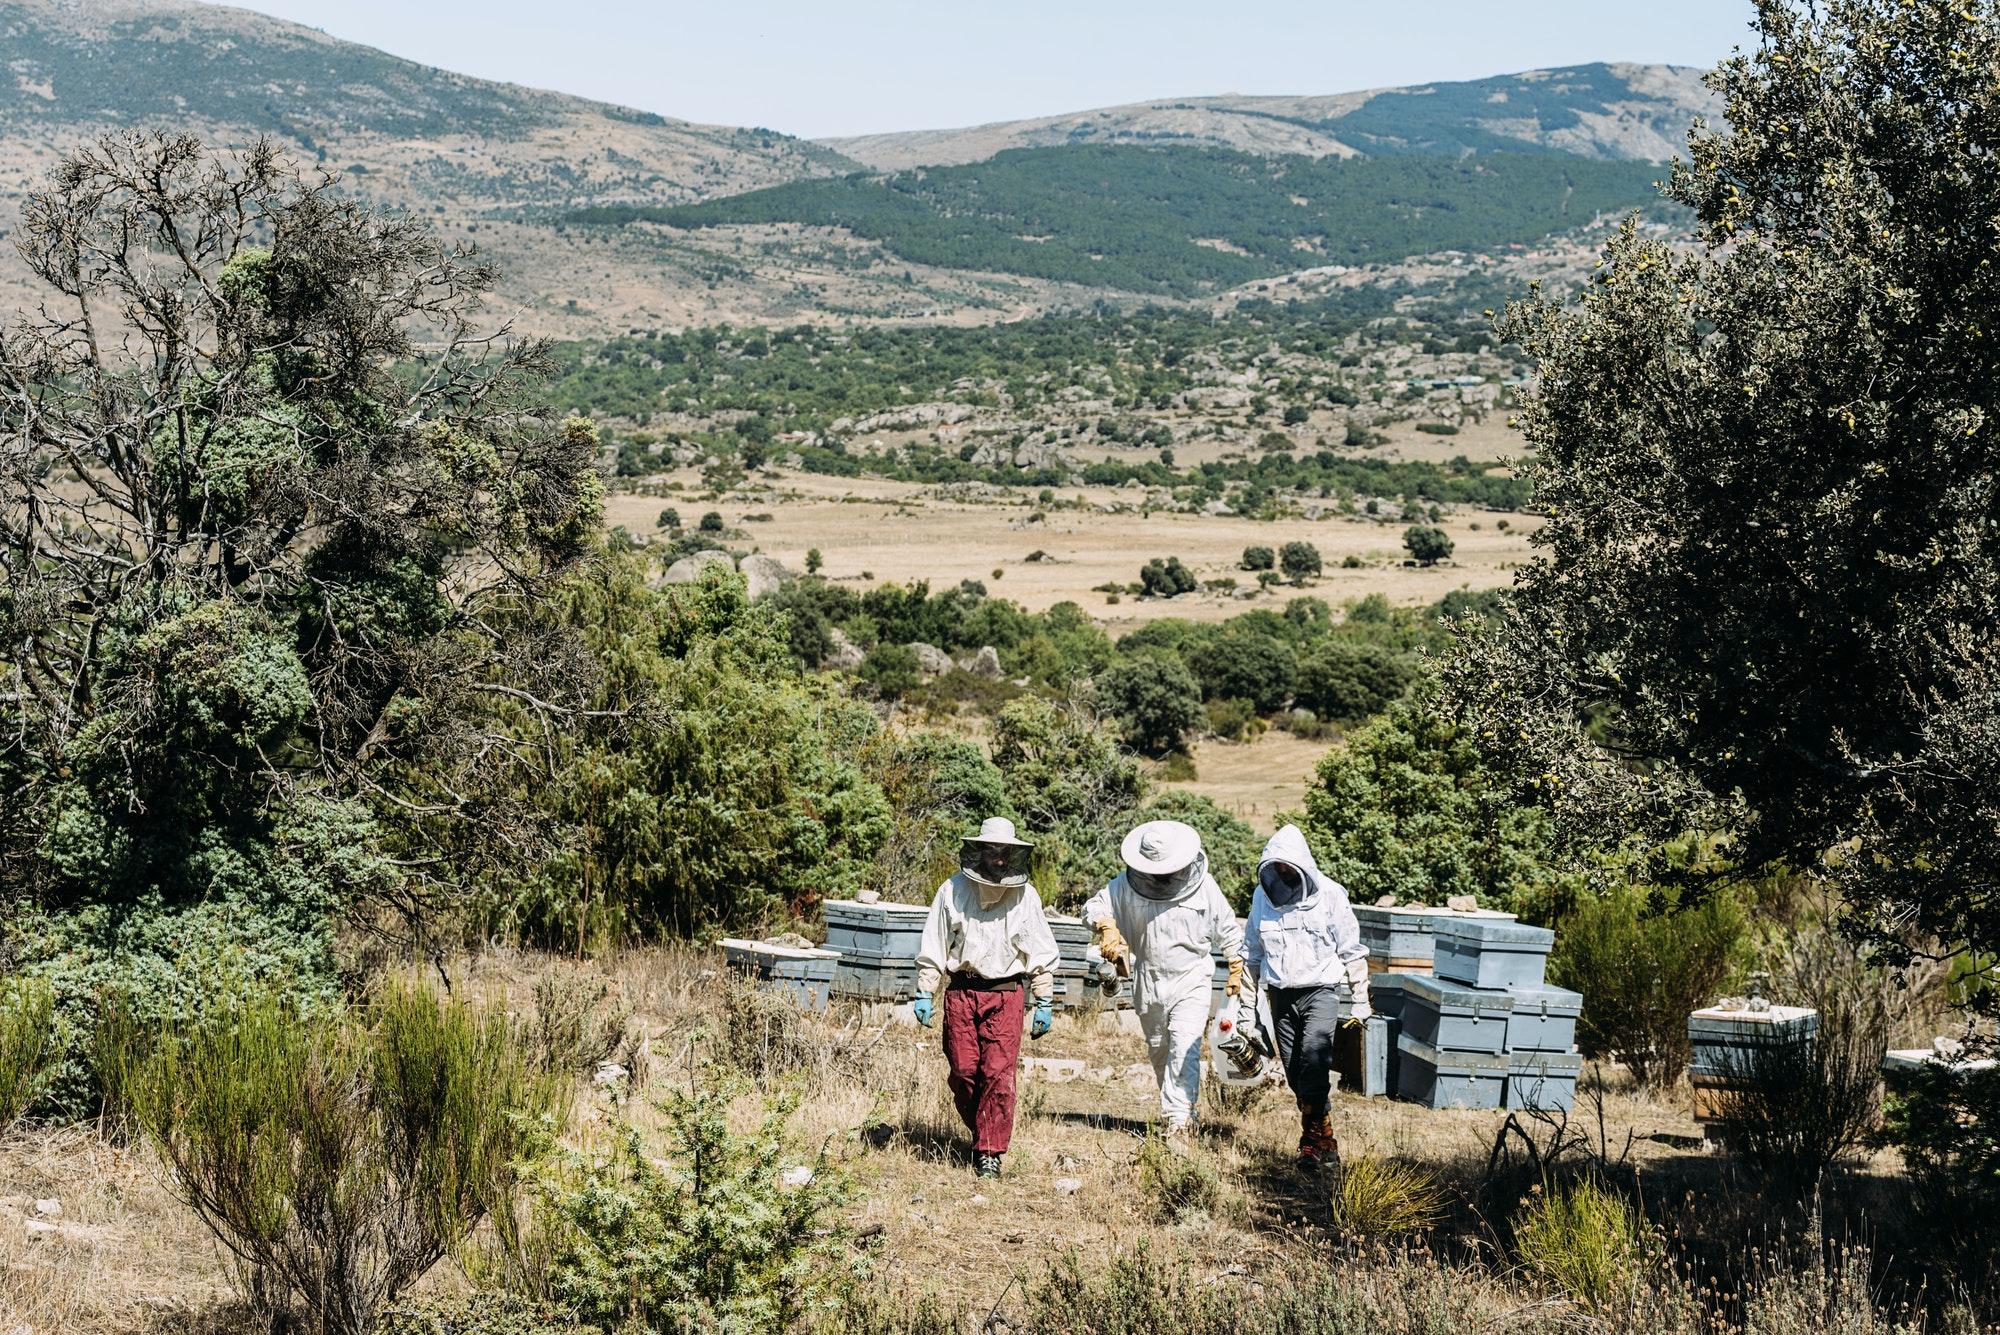 Beekeepers working collect honey.